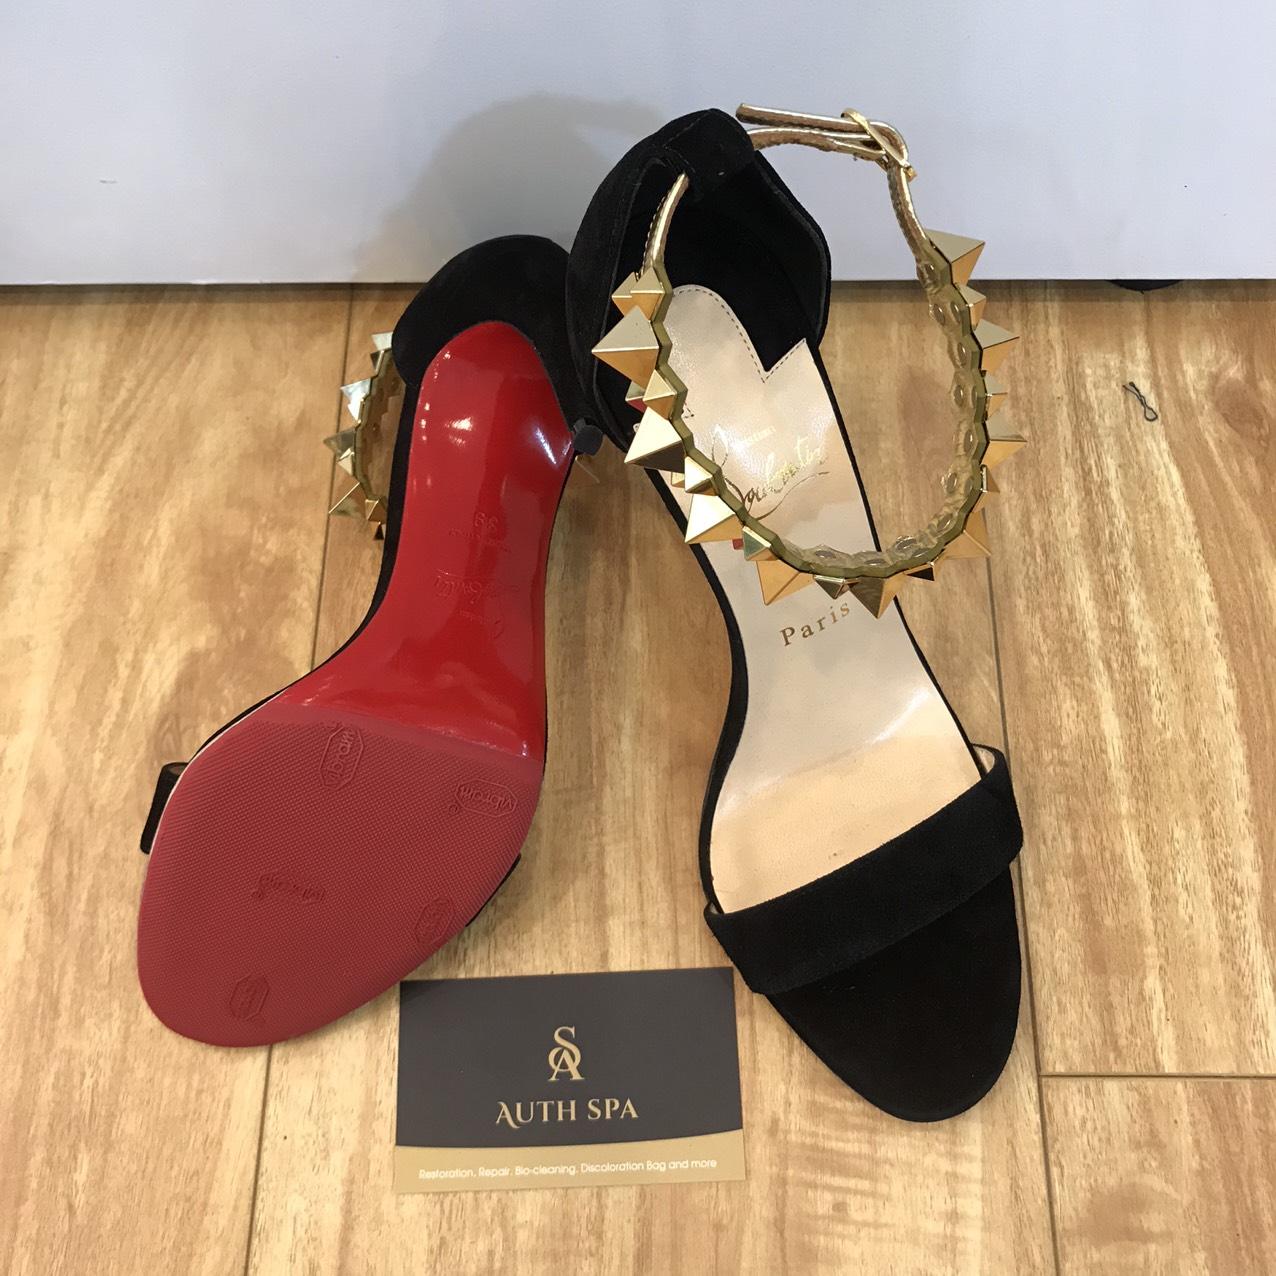 Sửa Chữa Giày Dép Gucci, Chanel, Louis Vuitton, Hermes ... 16